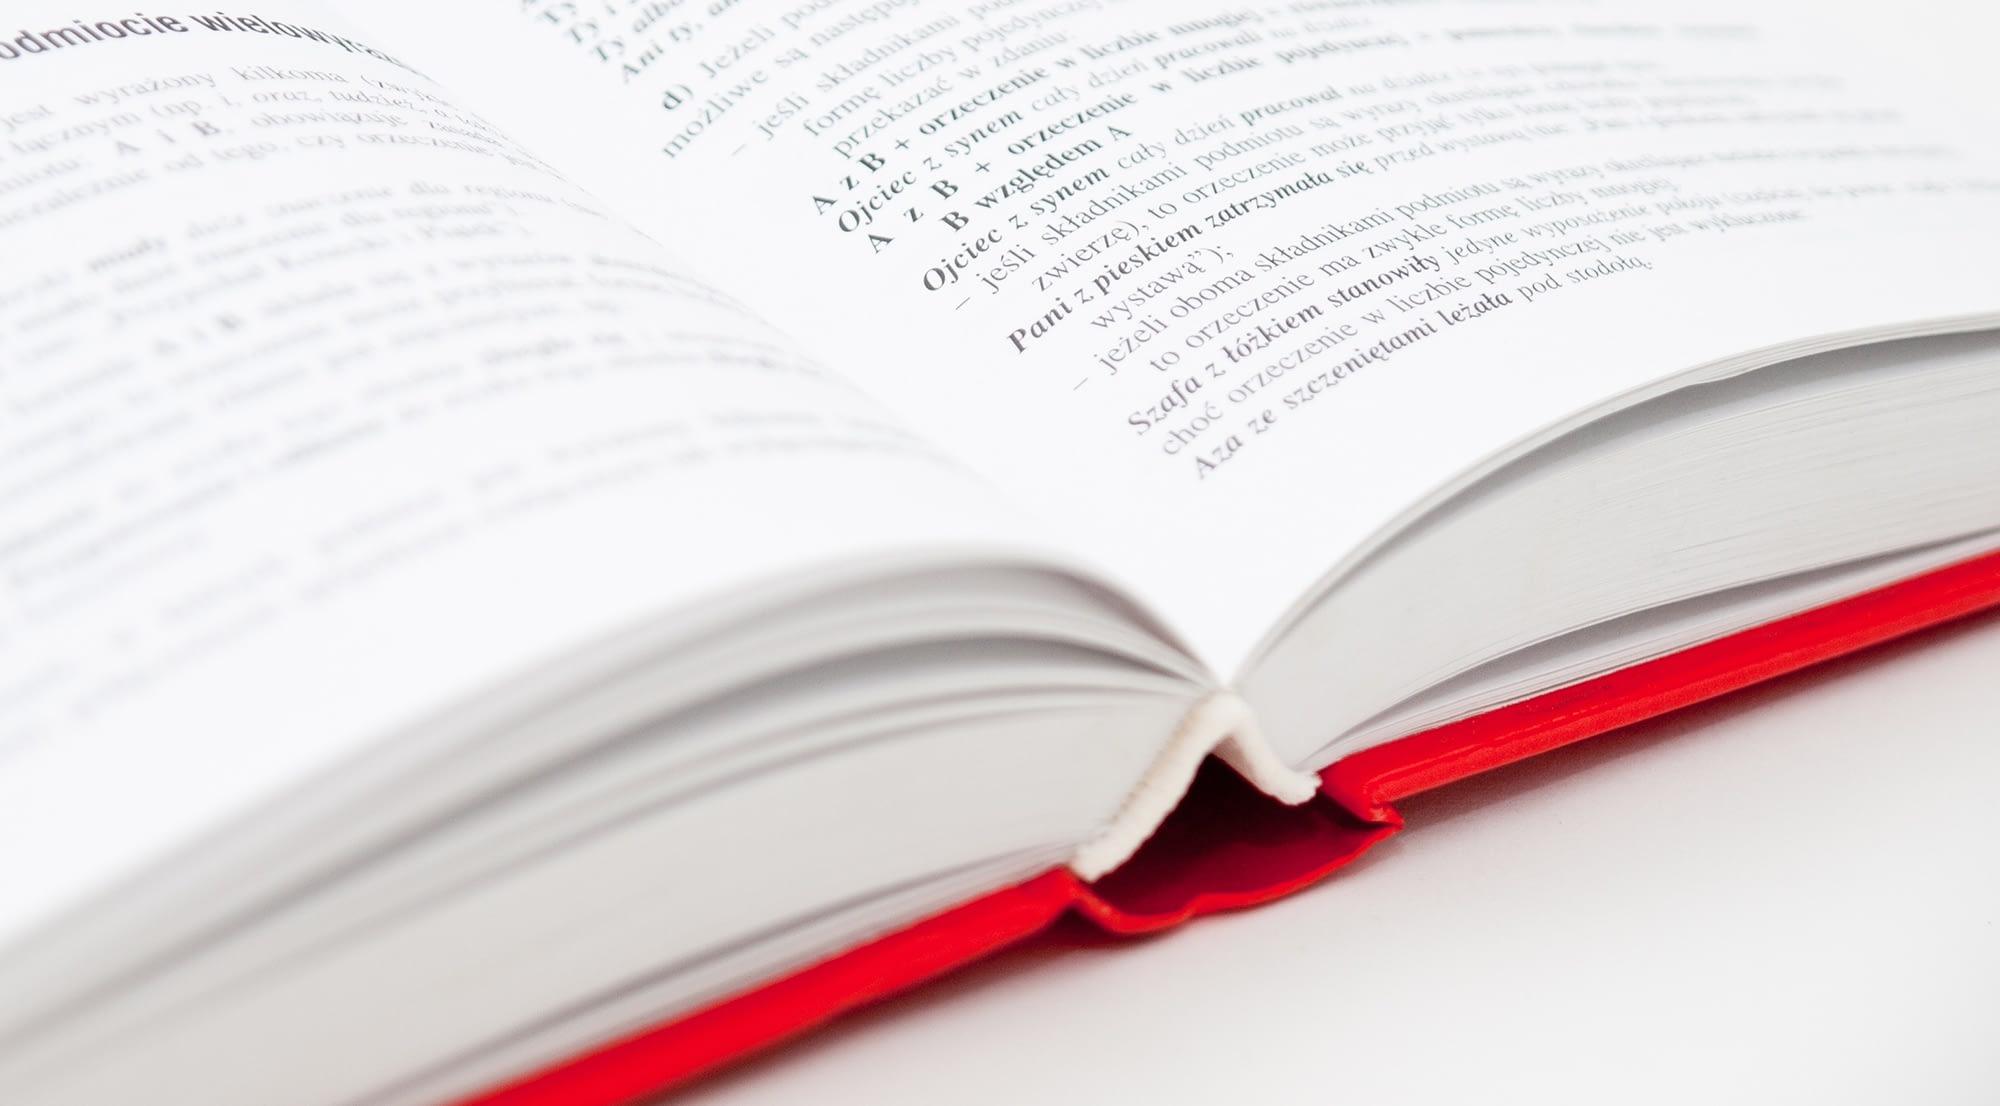 Professional Loss Adjusters Glossary